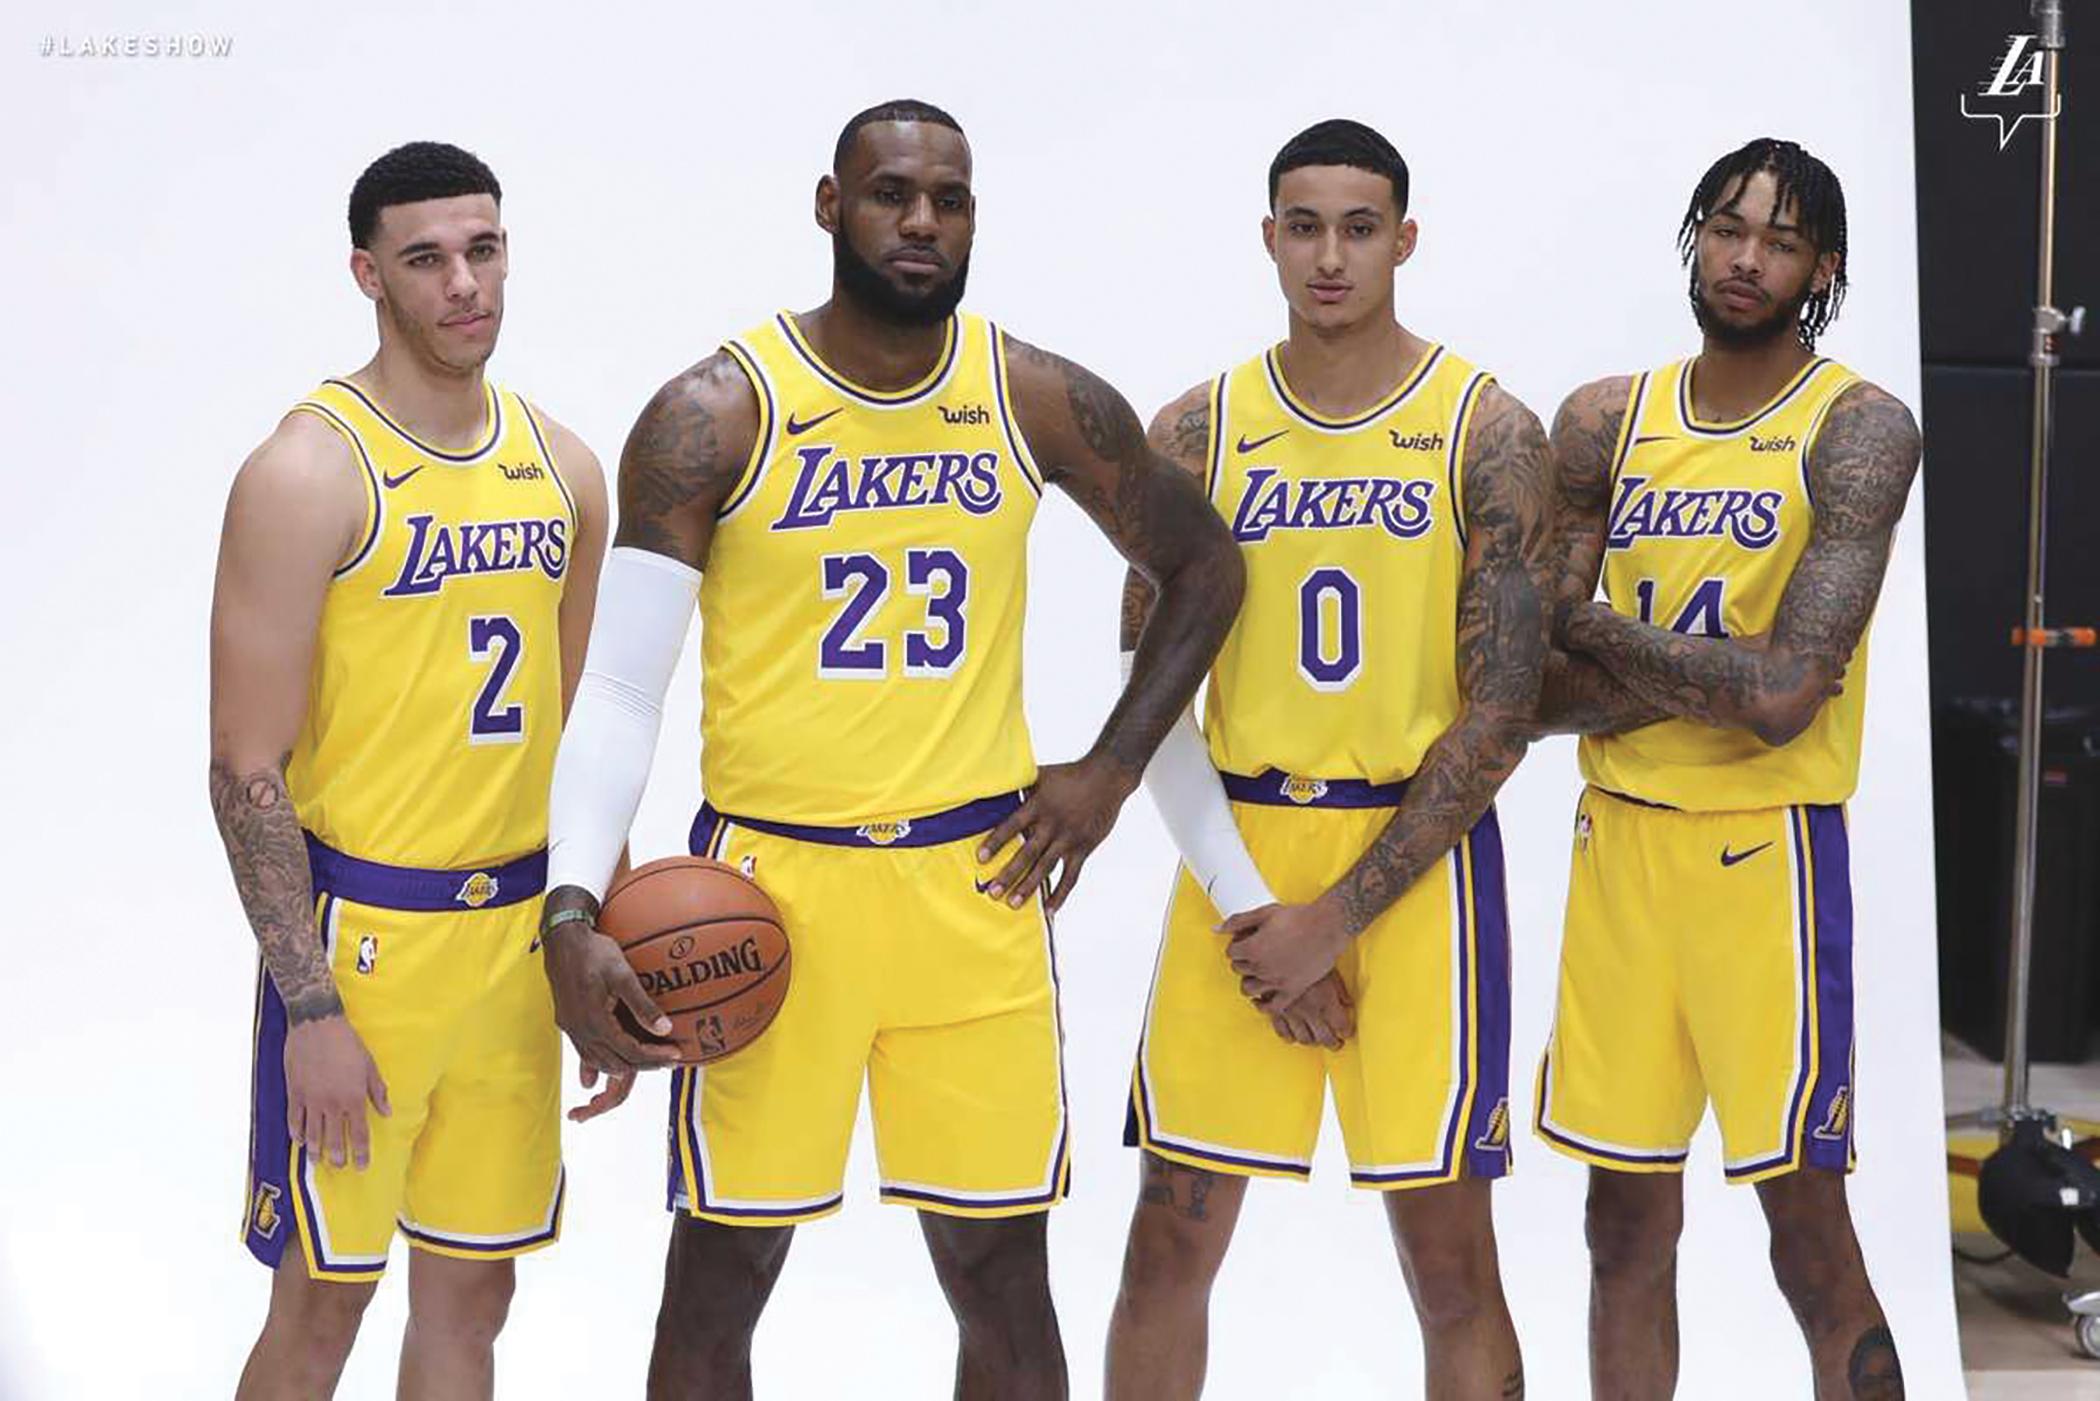 Lonzo Ball, LeBron James, Kyle Kuzma and Brandon Ingram pose for photos during Lakers media day. (Photo: @lakers)